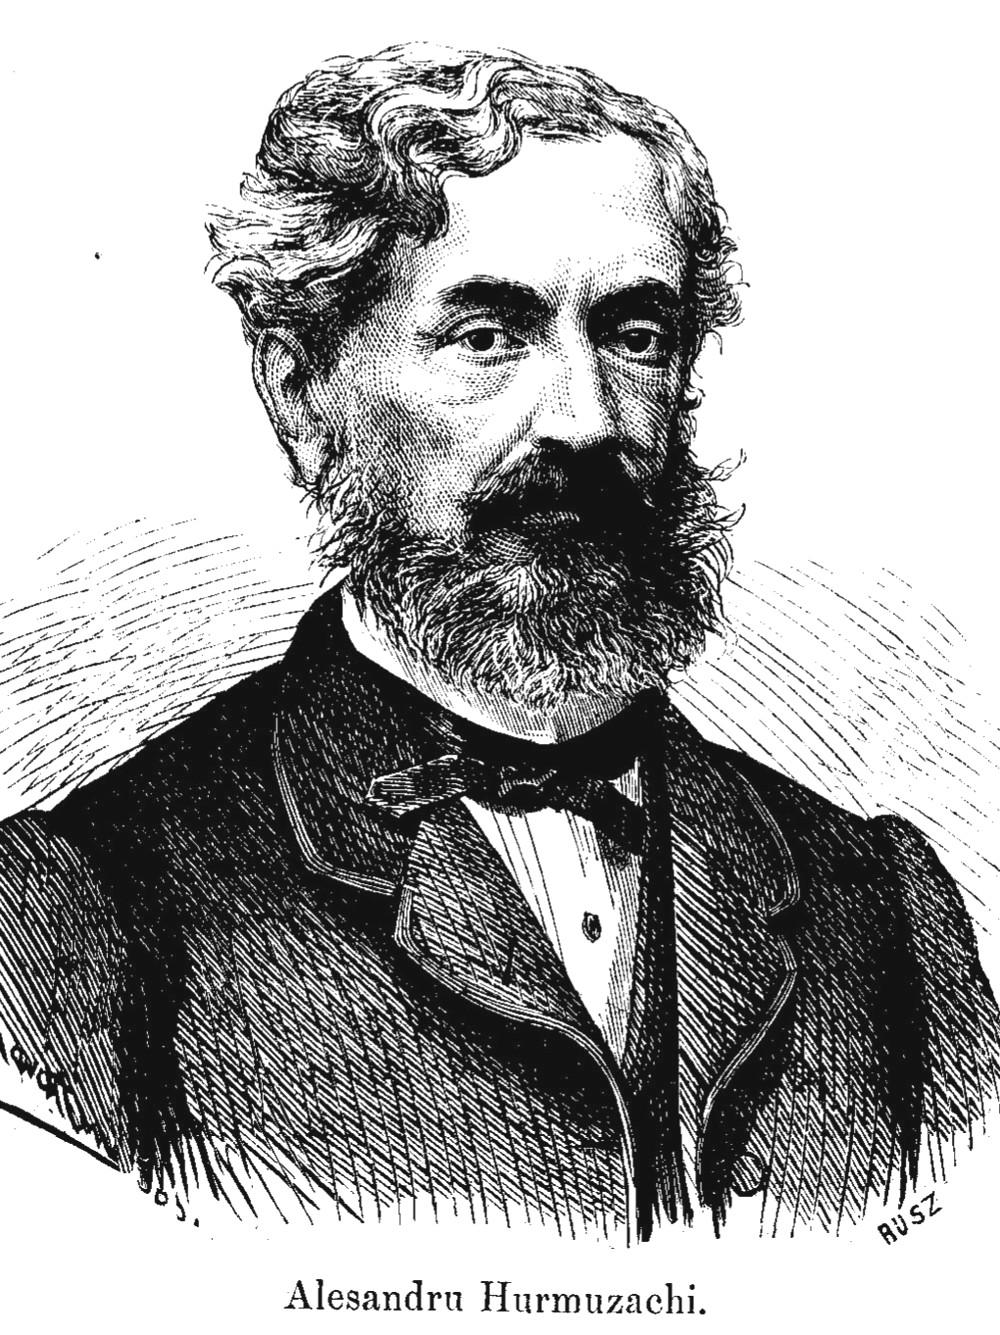 Hurmuzachi Alecsandru Familia 25 din 1866